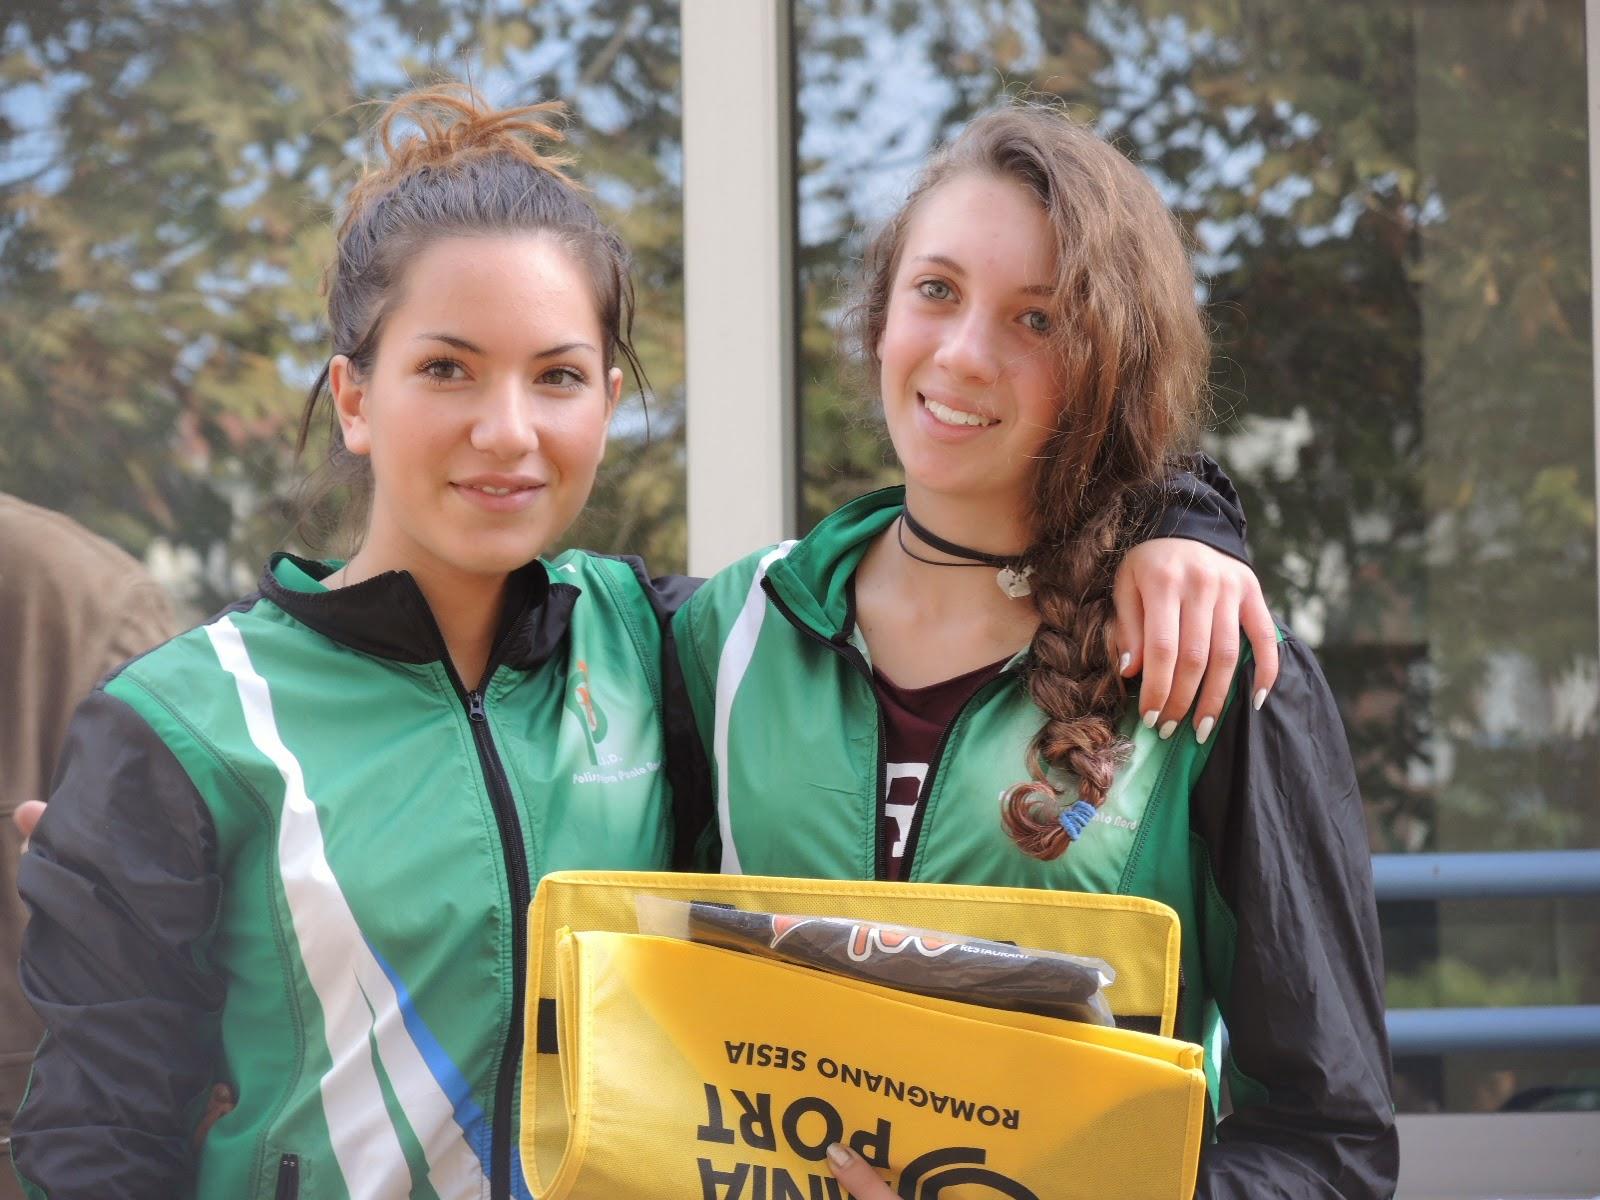 La PUNTO NORD a Ghemme (Campionato reg. Sprint); 2 Nov. 2014